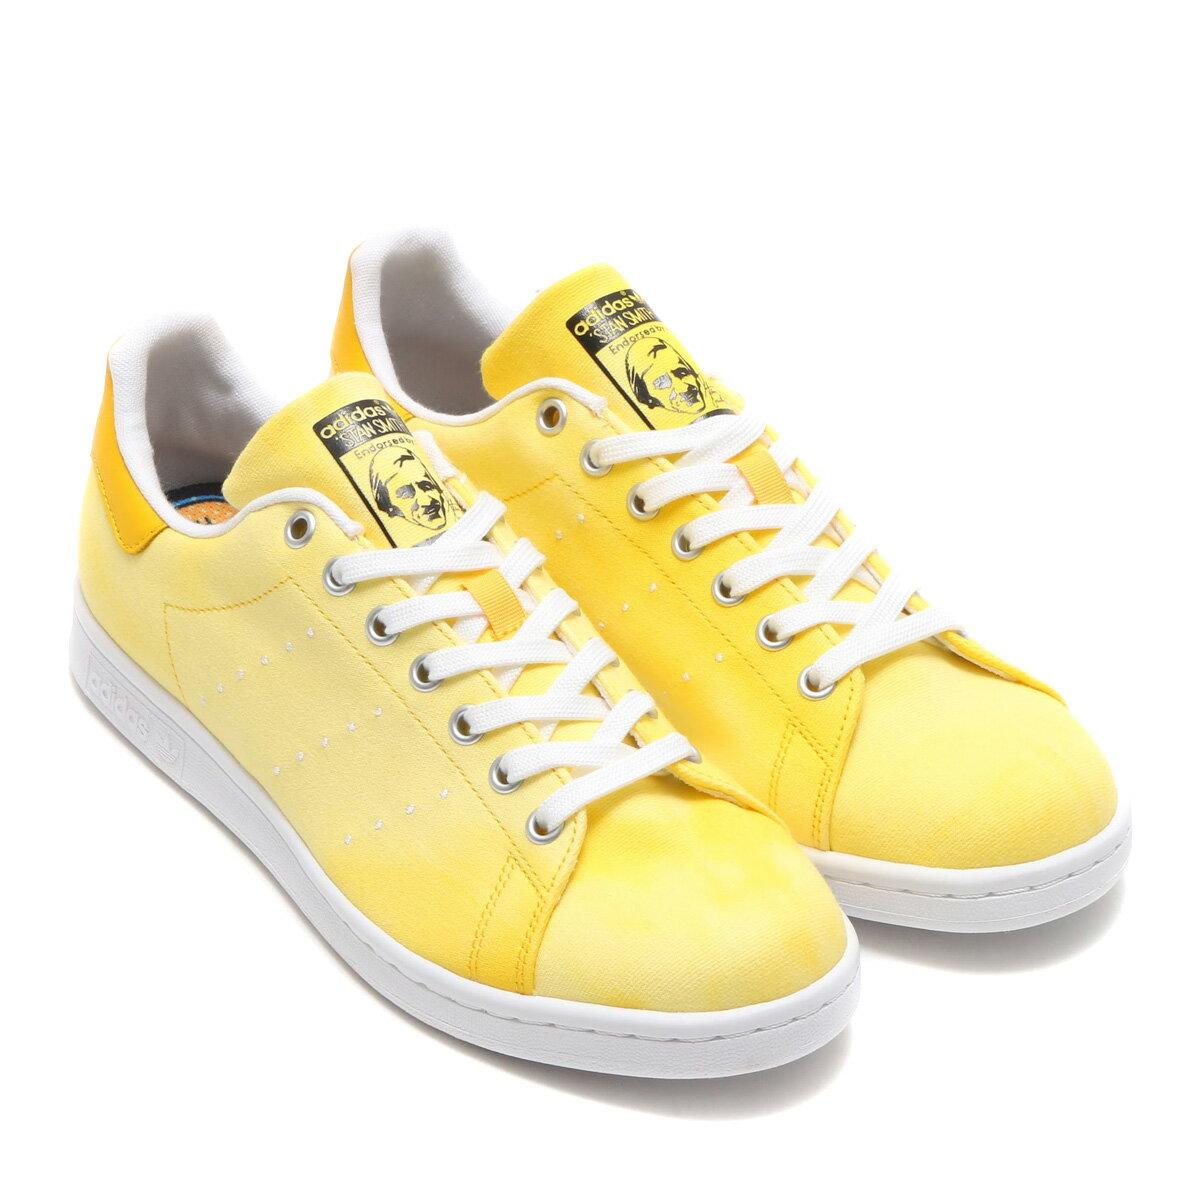 adidas Originals PW HU HOLI STAN SMITH (アディダス オリジナルス ファレル ウィリアムス HU HOLI スタンスミス) Yellow / Running White / Running White【メンズ スニーカー】18SS-S